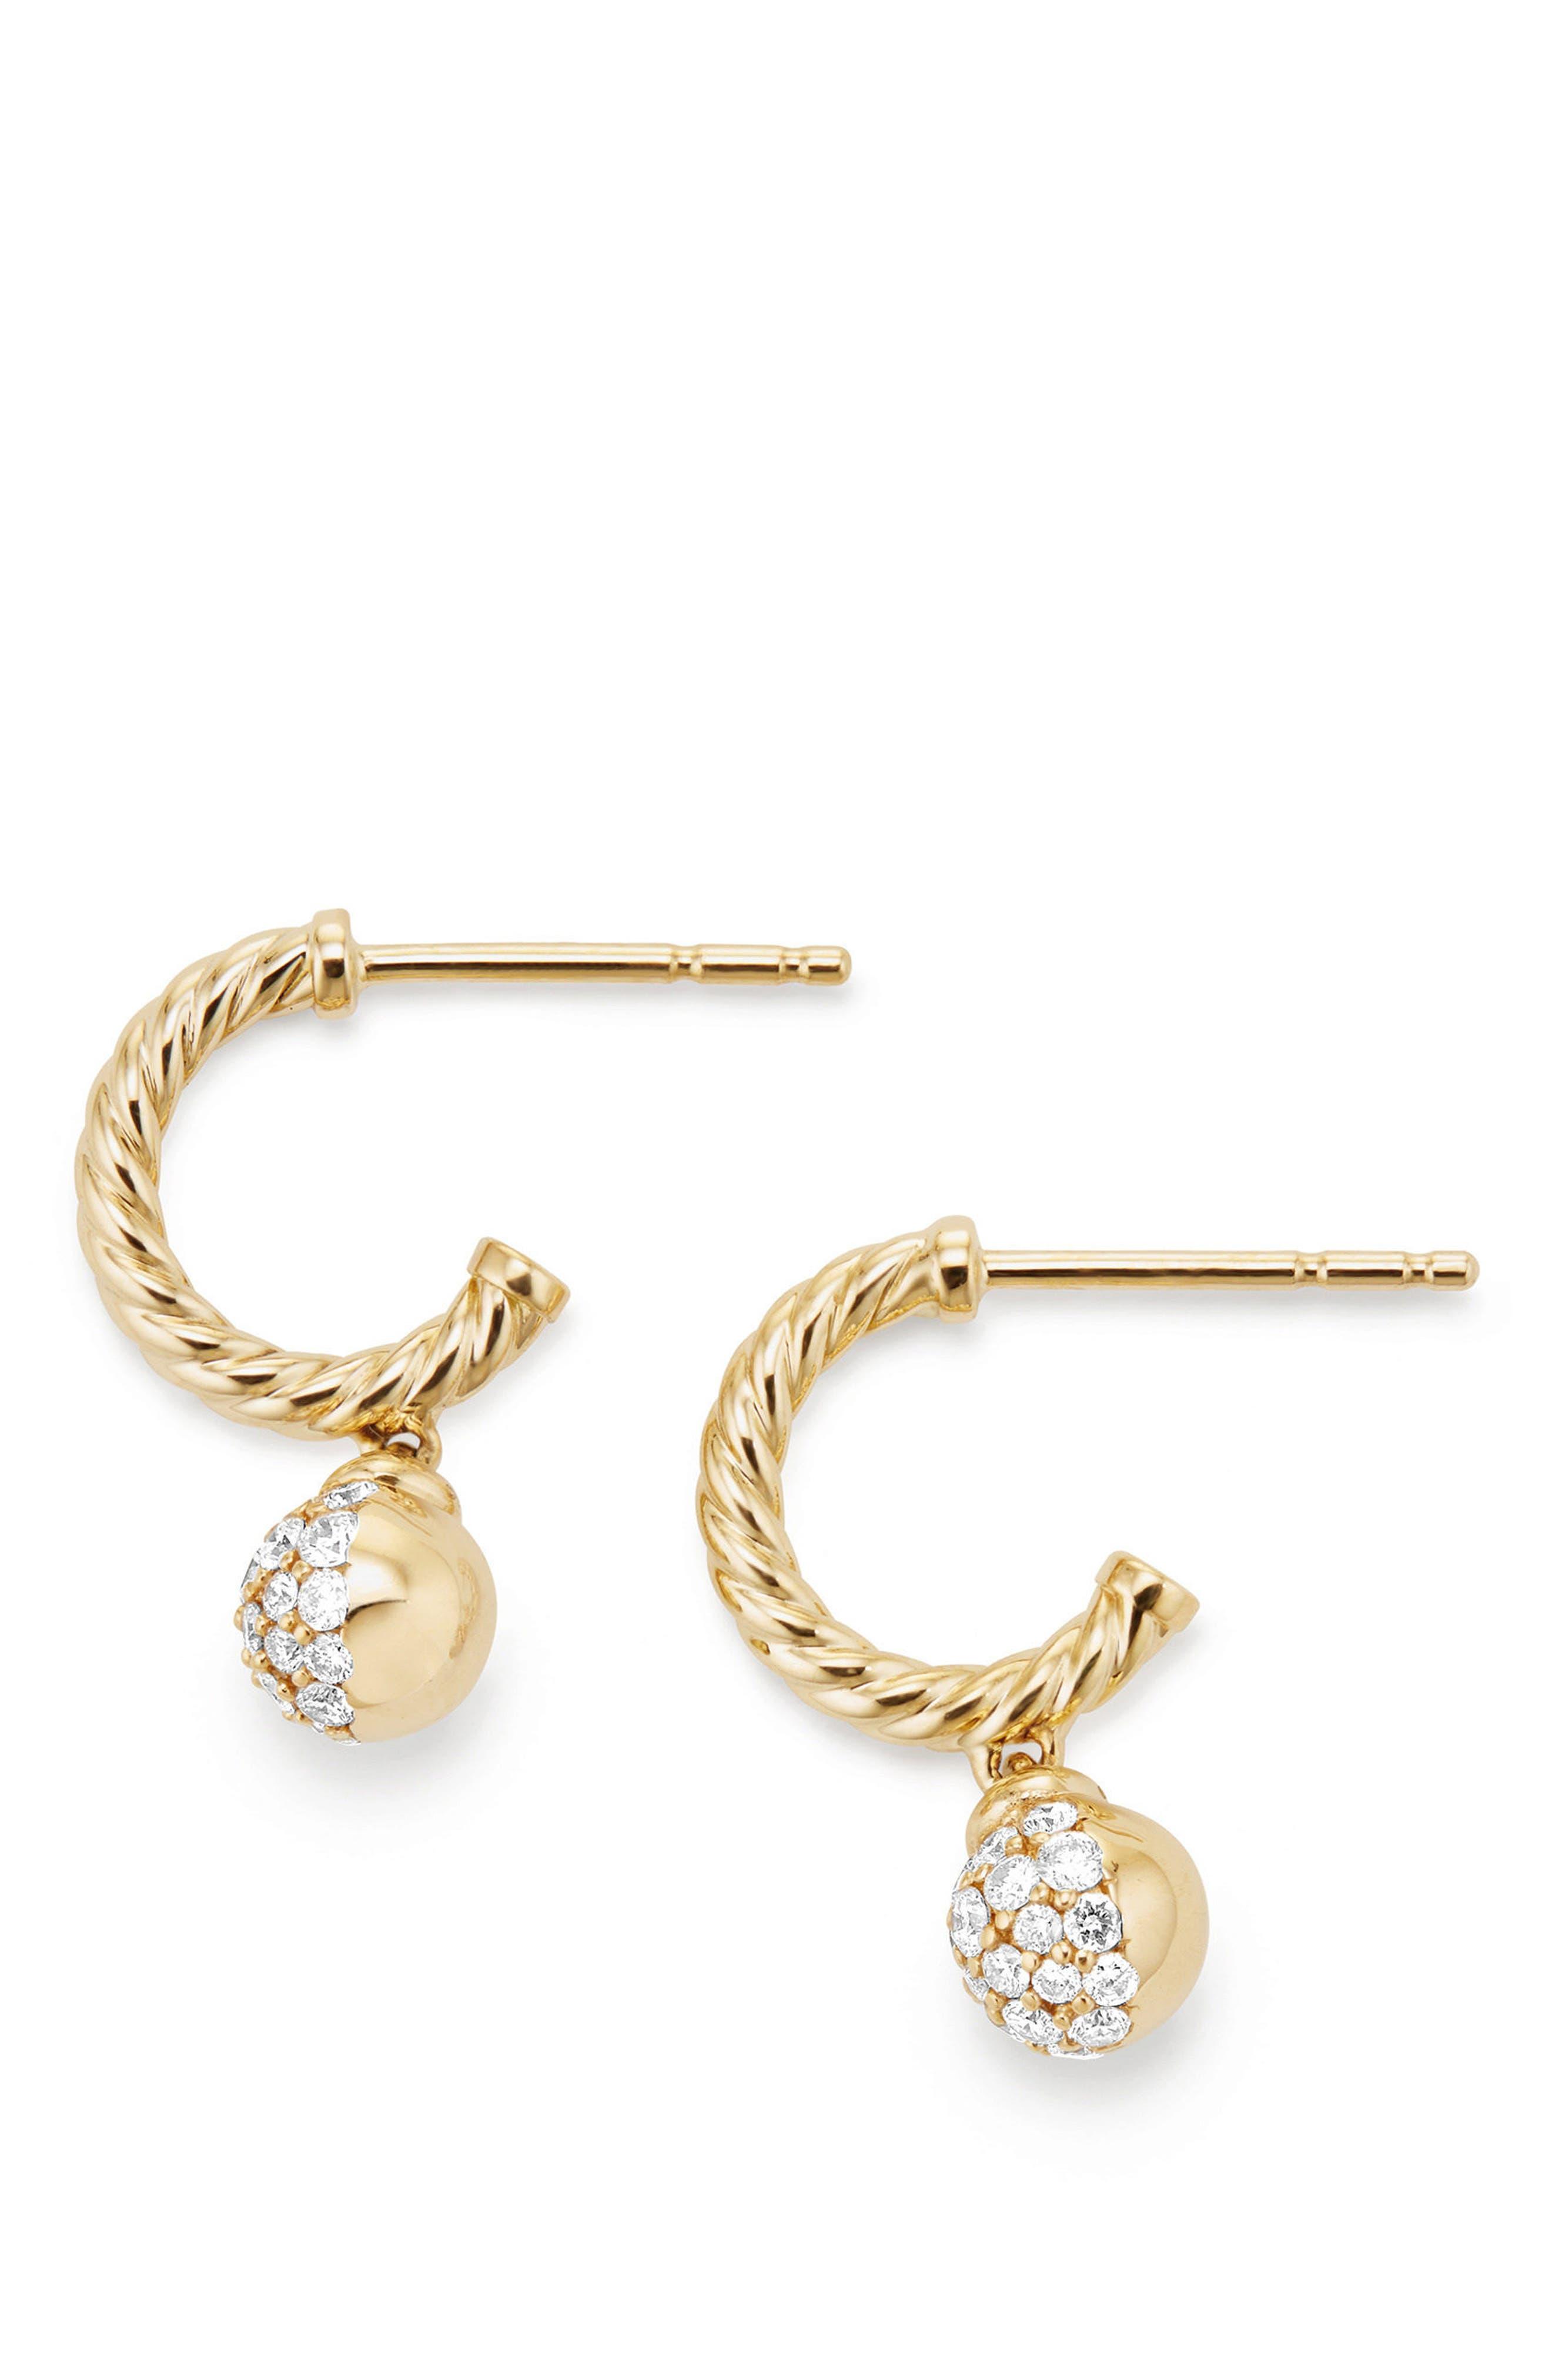 David Yurman Petite Solari Hoop Pavé Earrings with Diamonds in 18K Gold